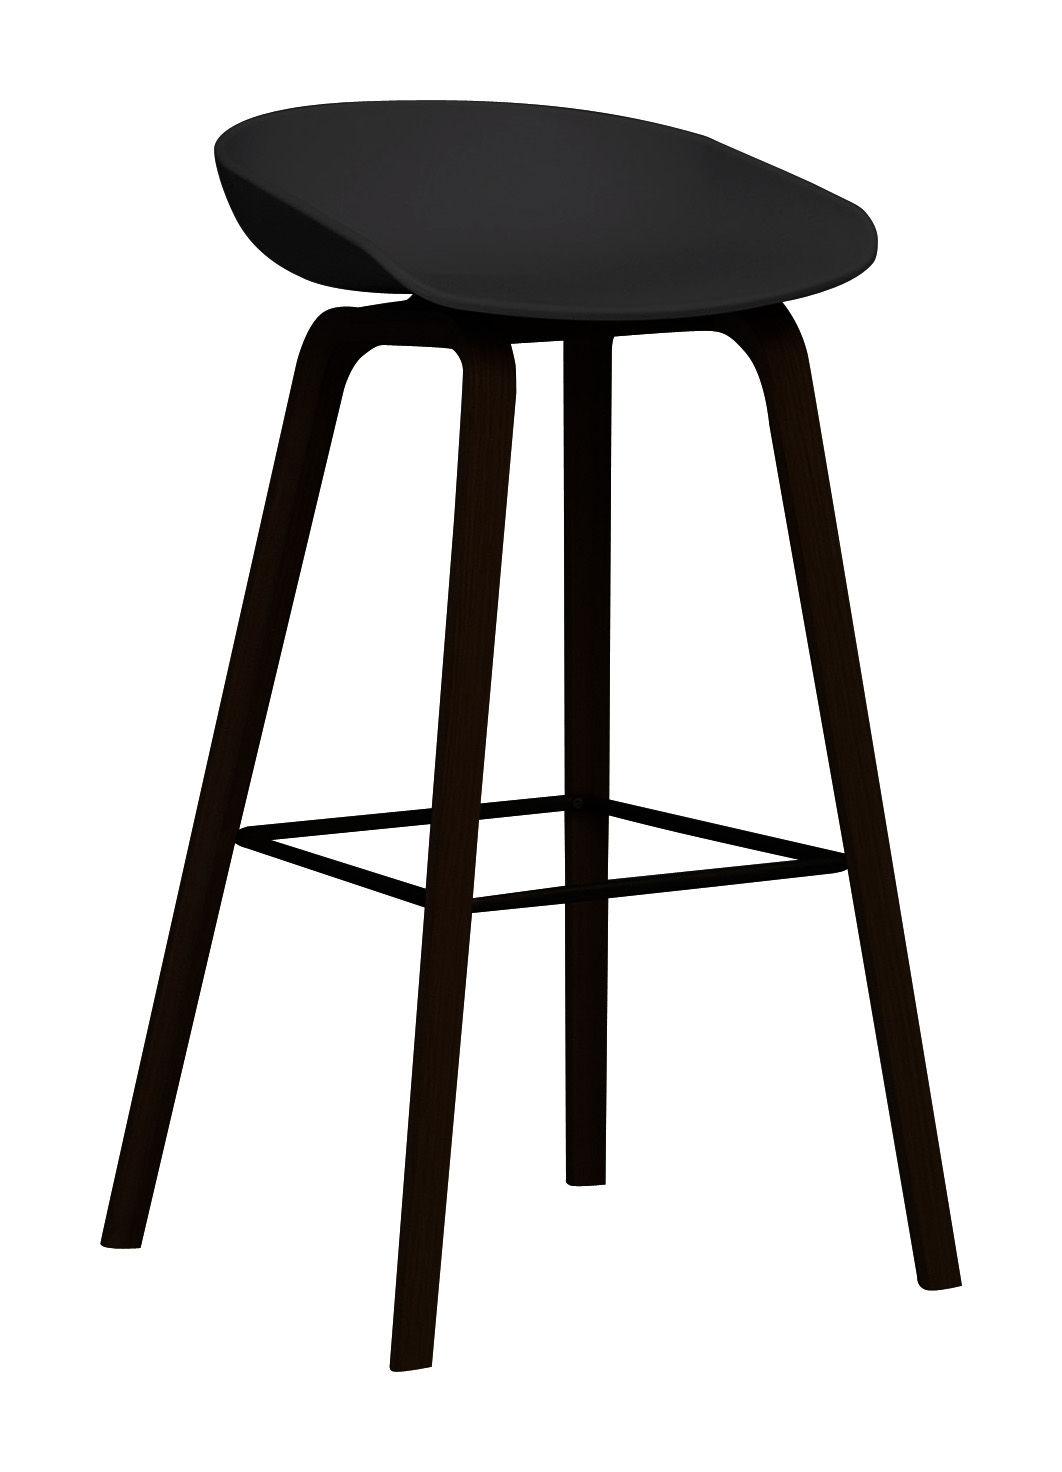 Möbel - Barhocker - About a stool AAS 32 Barhocker - Hay - Schwarz - Gestell Holz schwarz gebeizt - Esche, Polypropylen